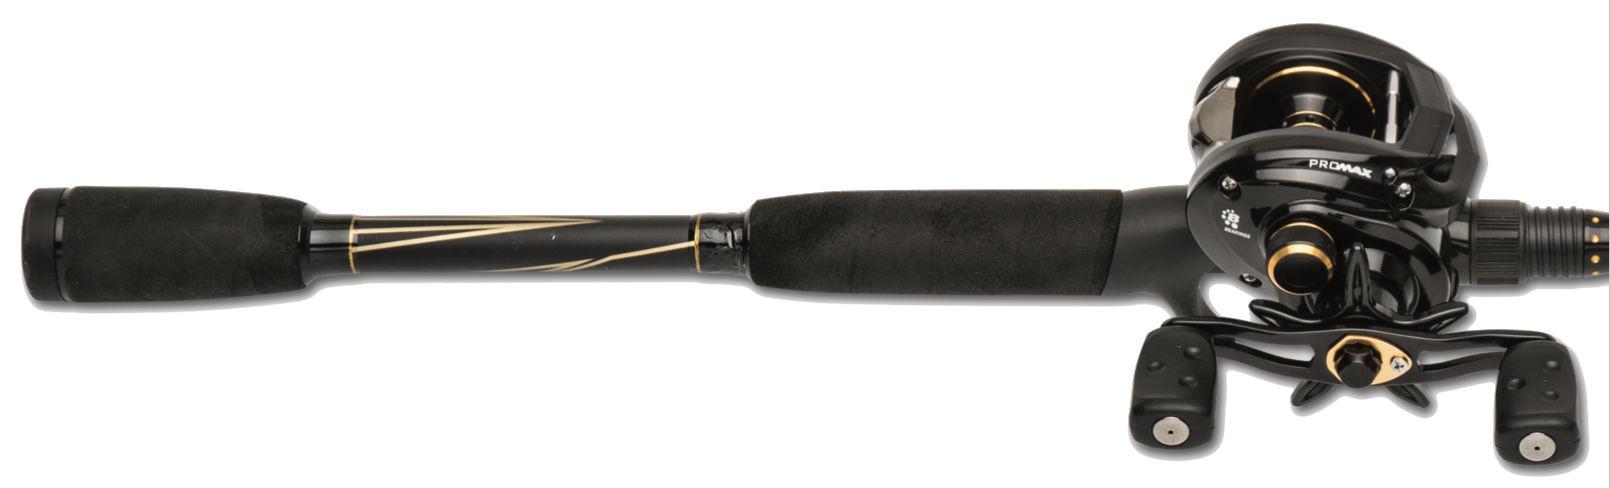 Abu Garcia Pro Max Low Profile Baitcast Reel and Fishing Rod Combo $54.91 at Walmart